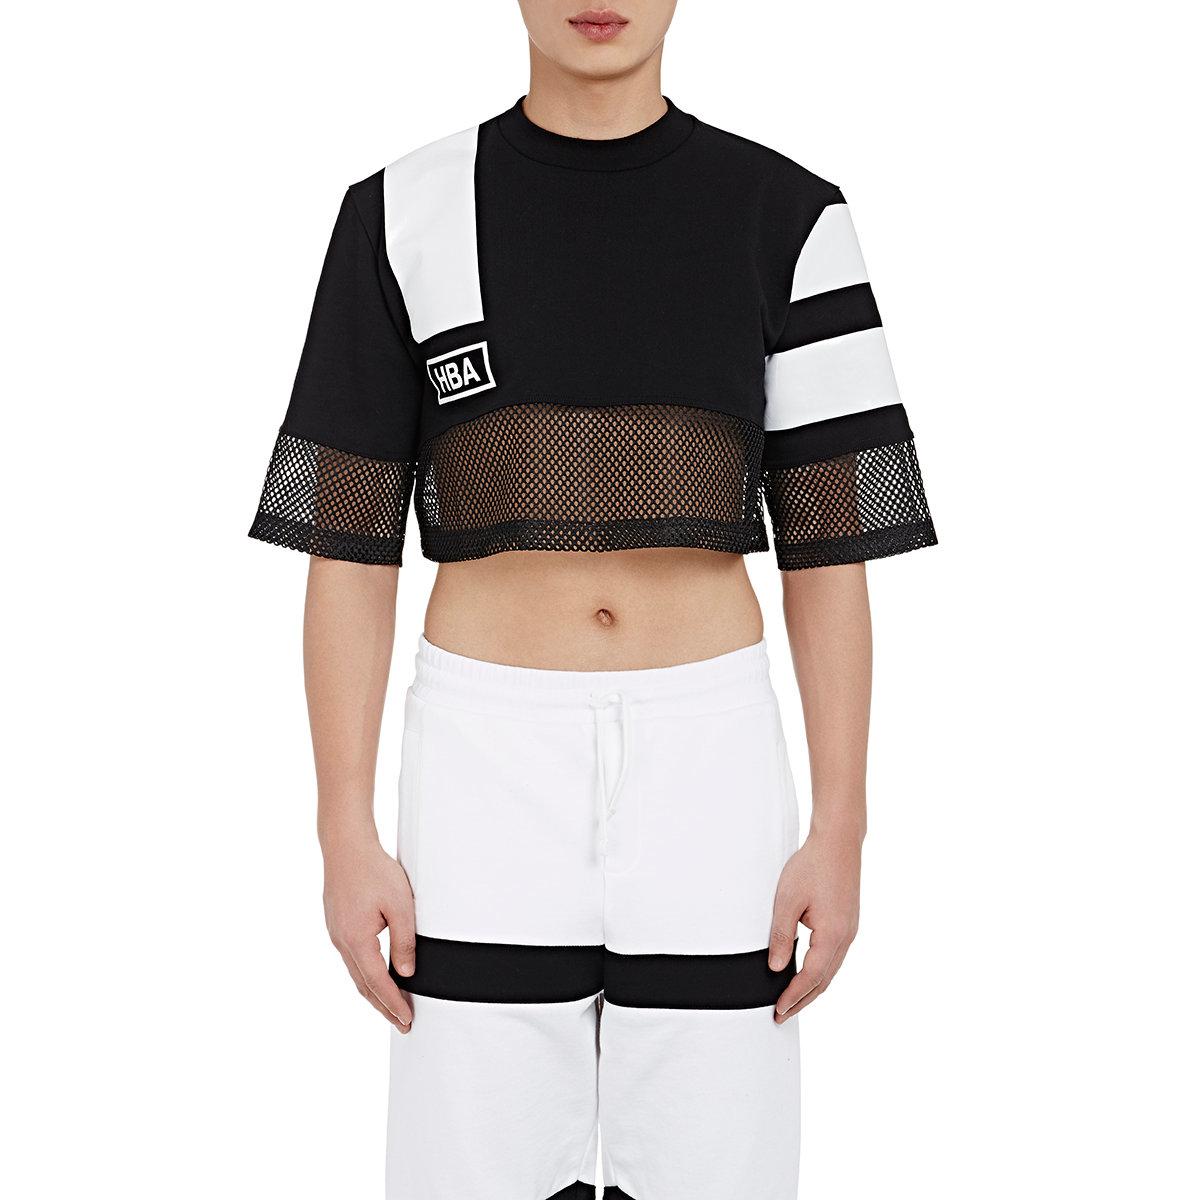 9da12738483 Hood By Air Men's Mesh-trimmed Crop Sweatshirt in Black - Lyst